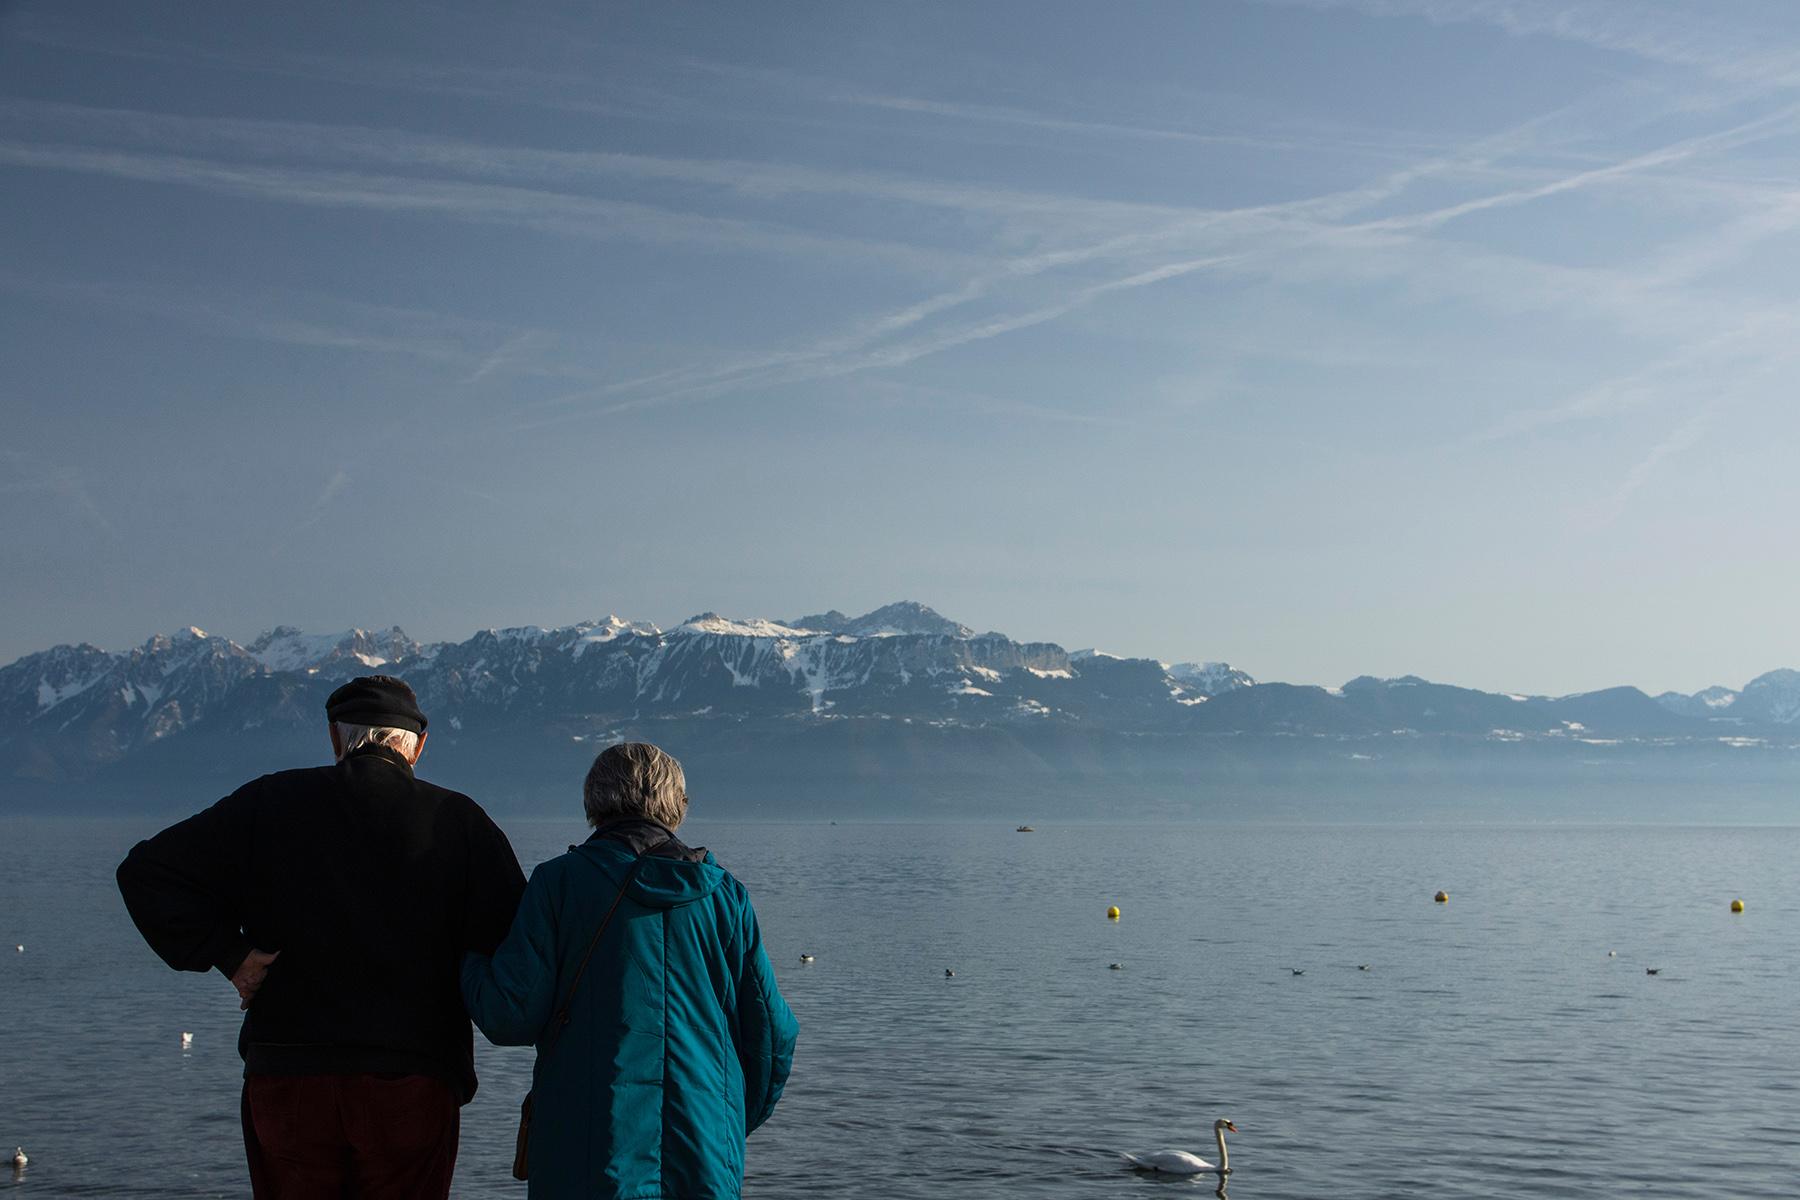 A retired couple at Lake Geneva